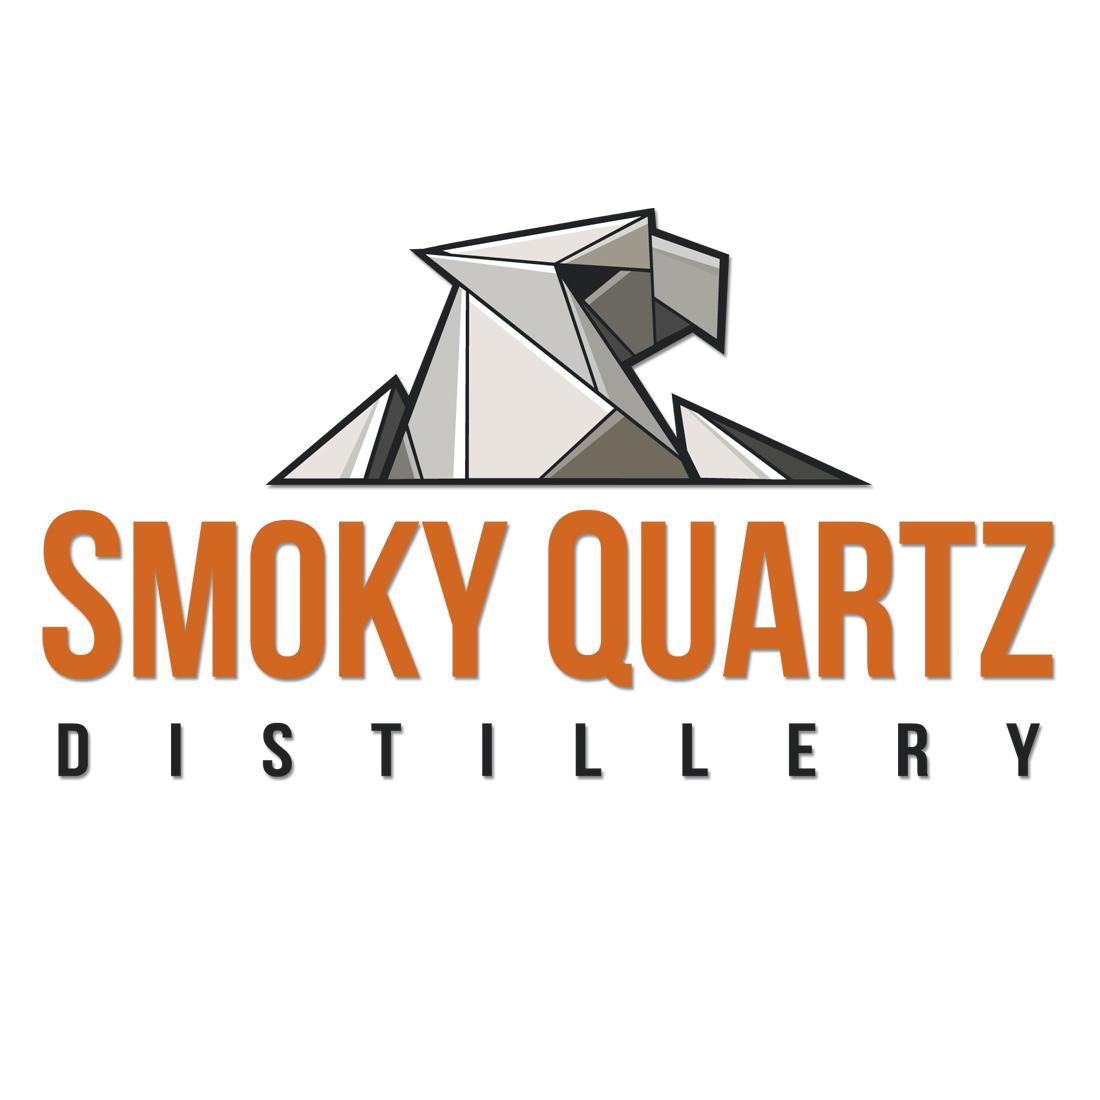 Smokey Quartz Distillery - Logo, Seabrook NH